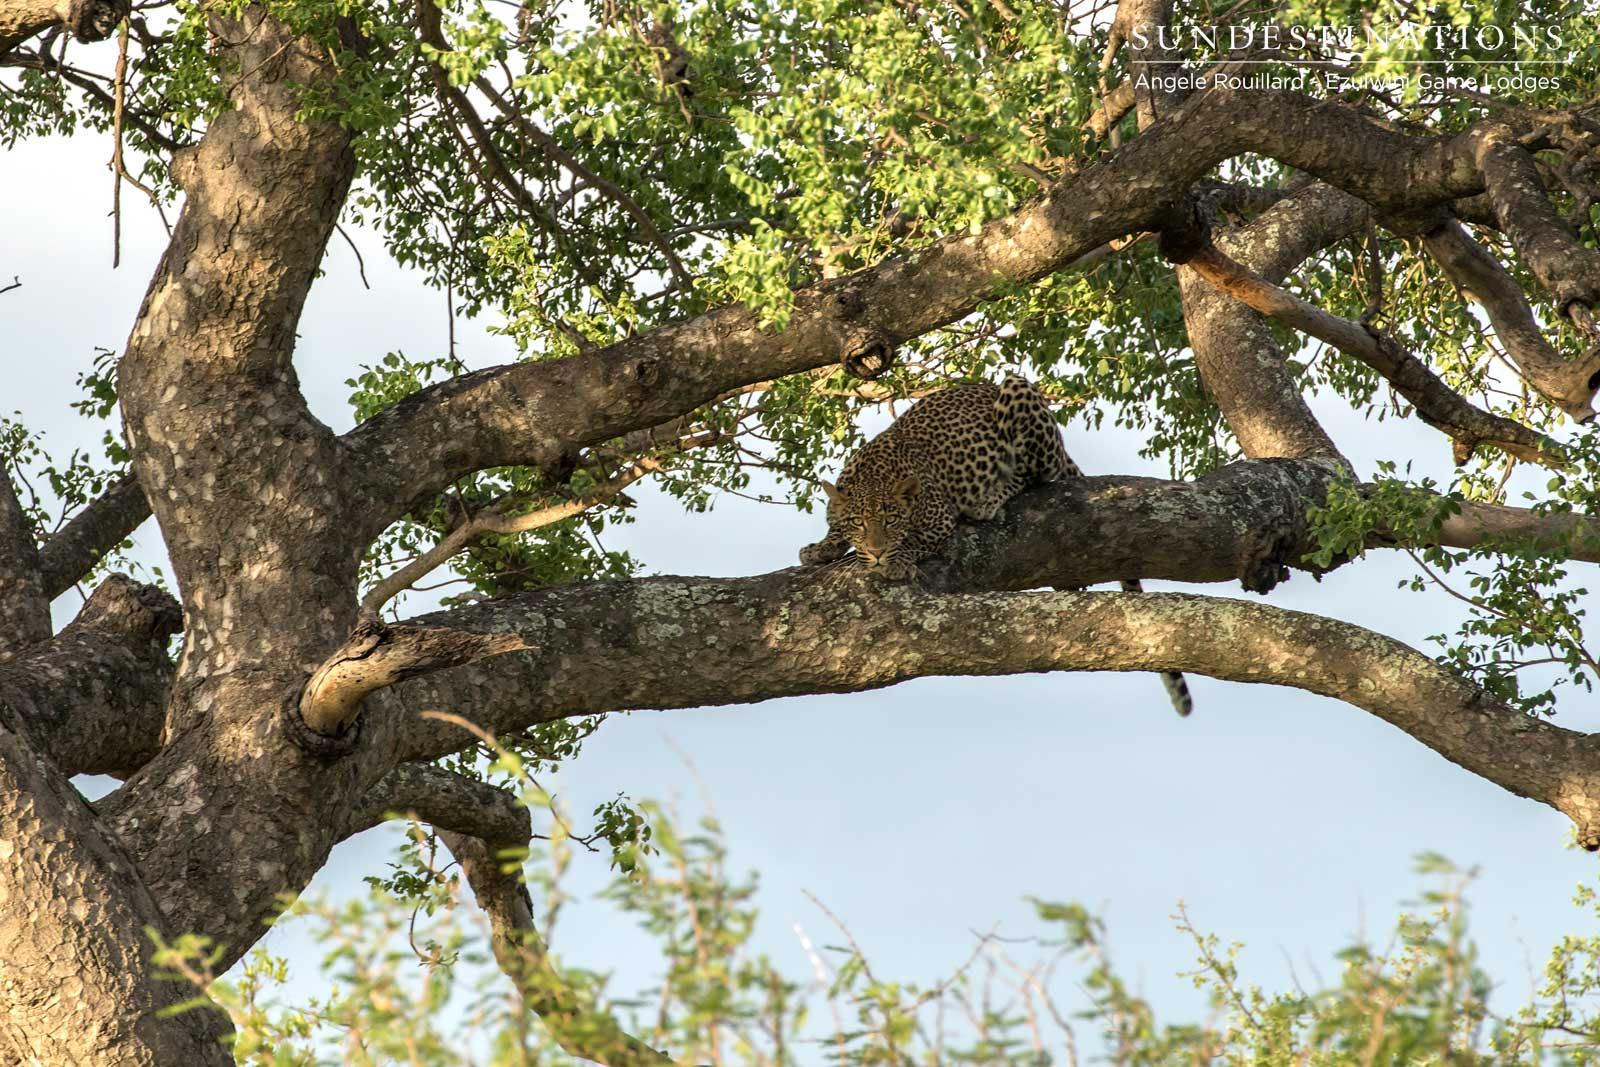 Leopards of Ezulwini